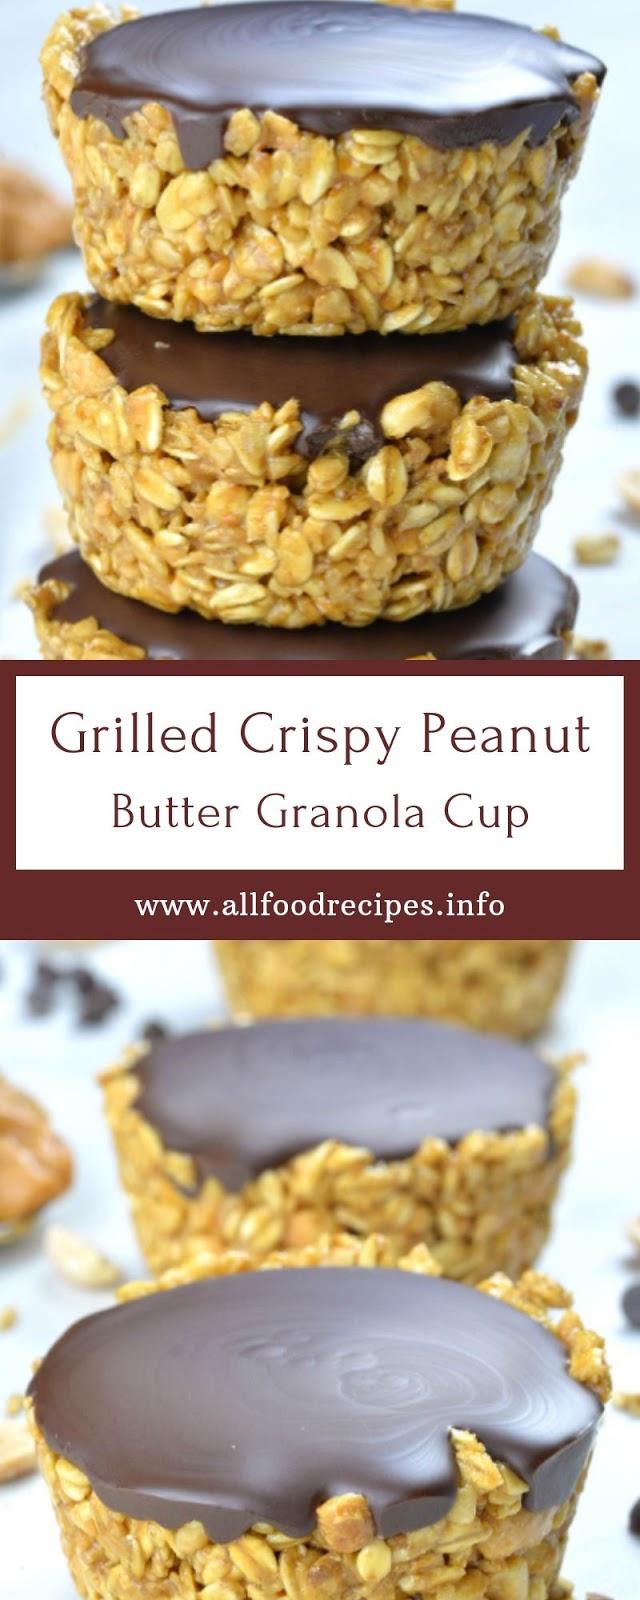 Grilled Crispy Peanut Butter Granola Cup